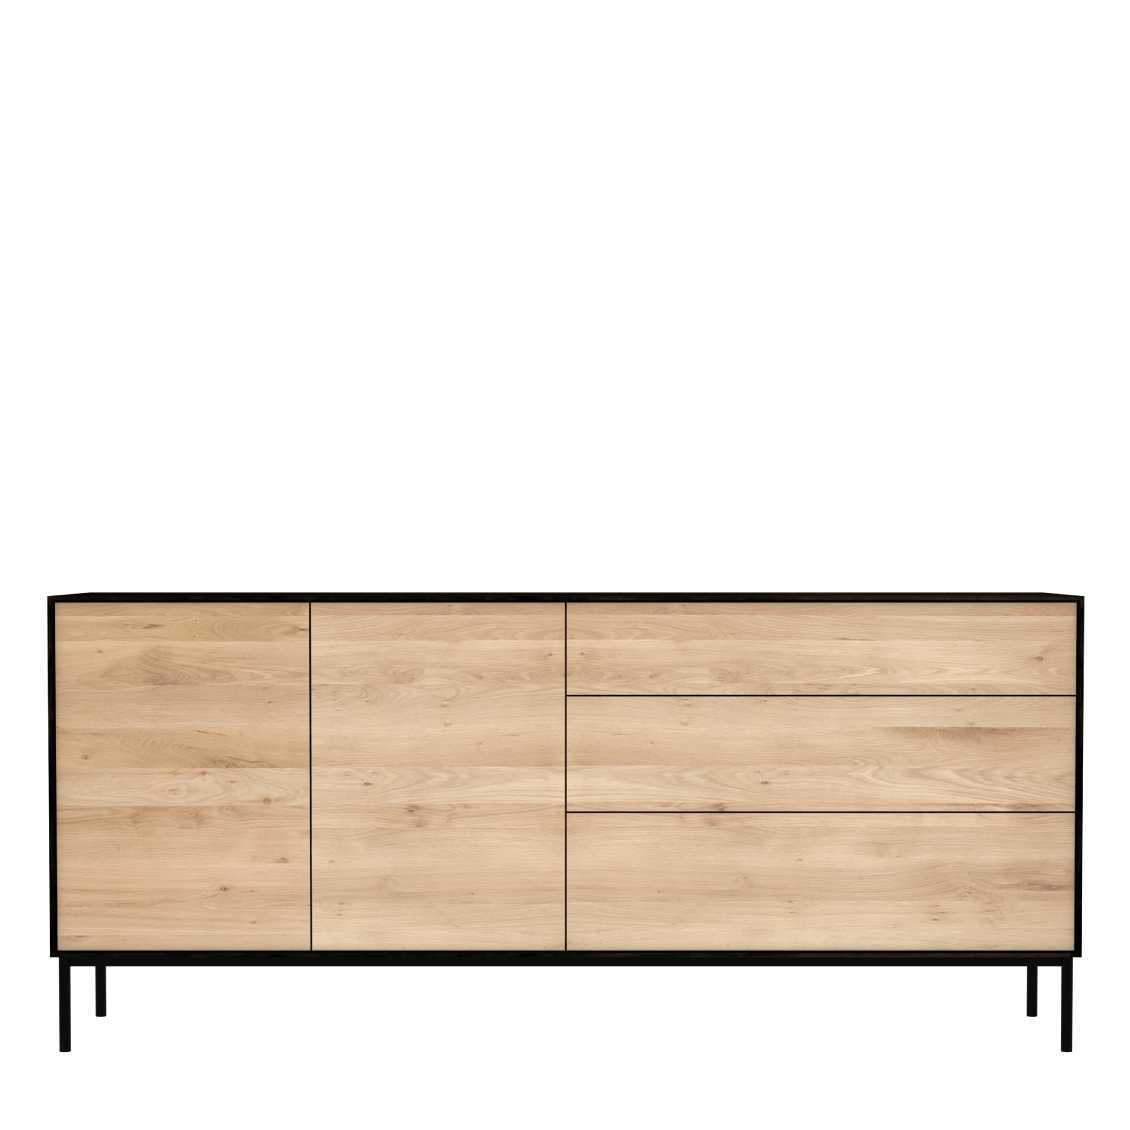 Ethnicraft Blackbird dressoir-180x80 cm